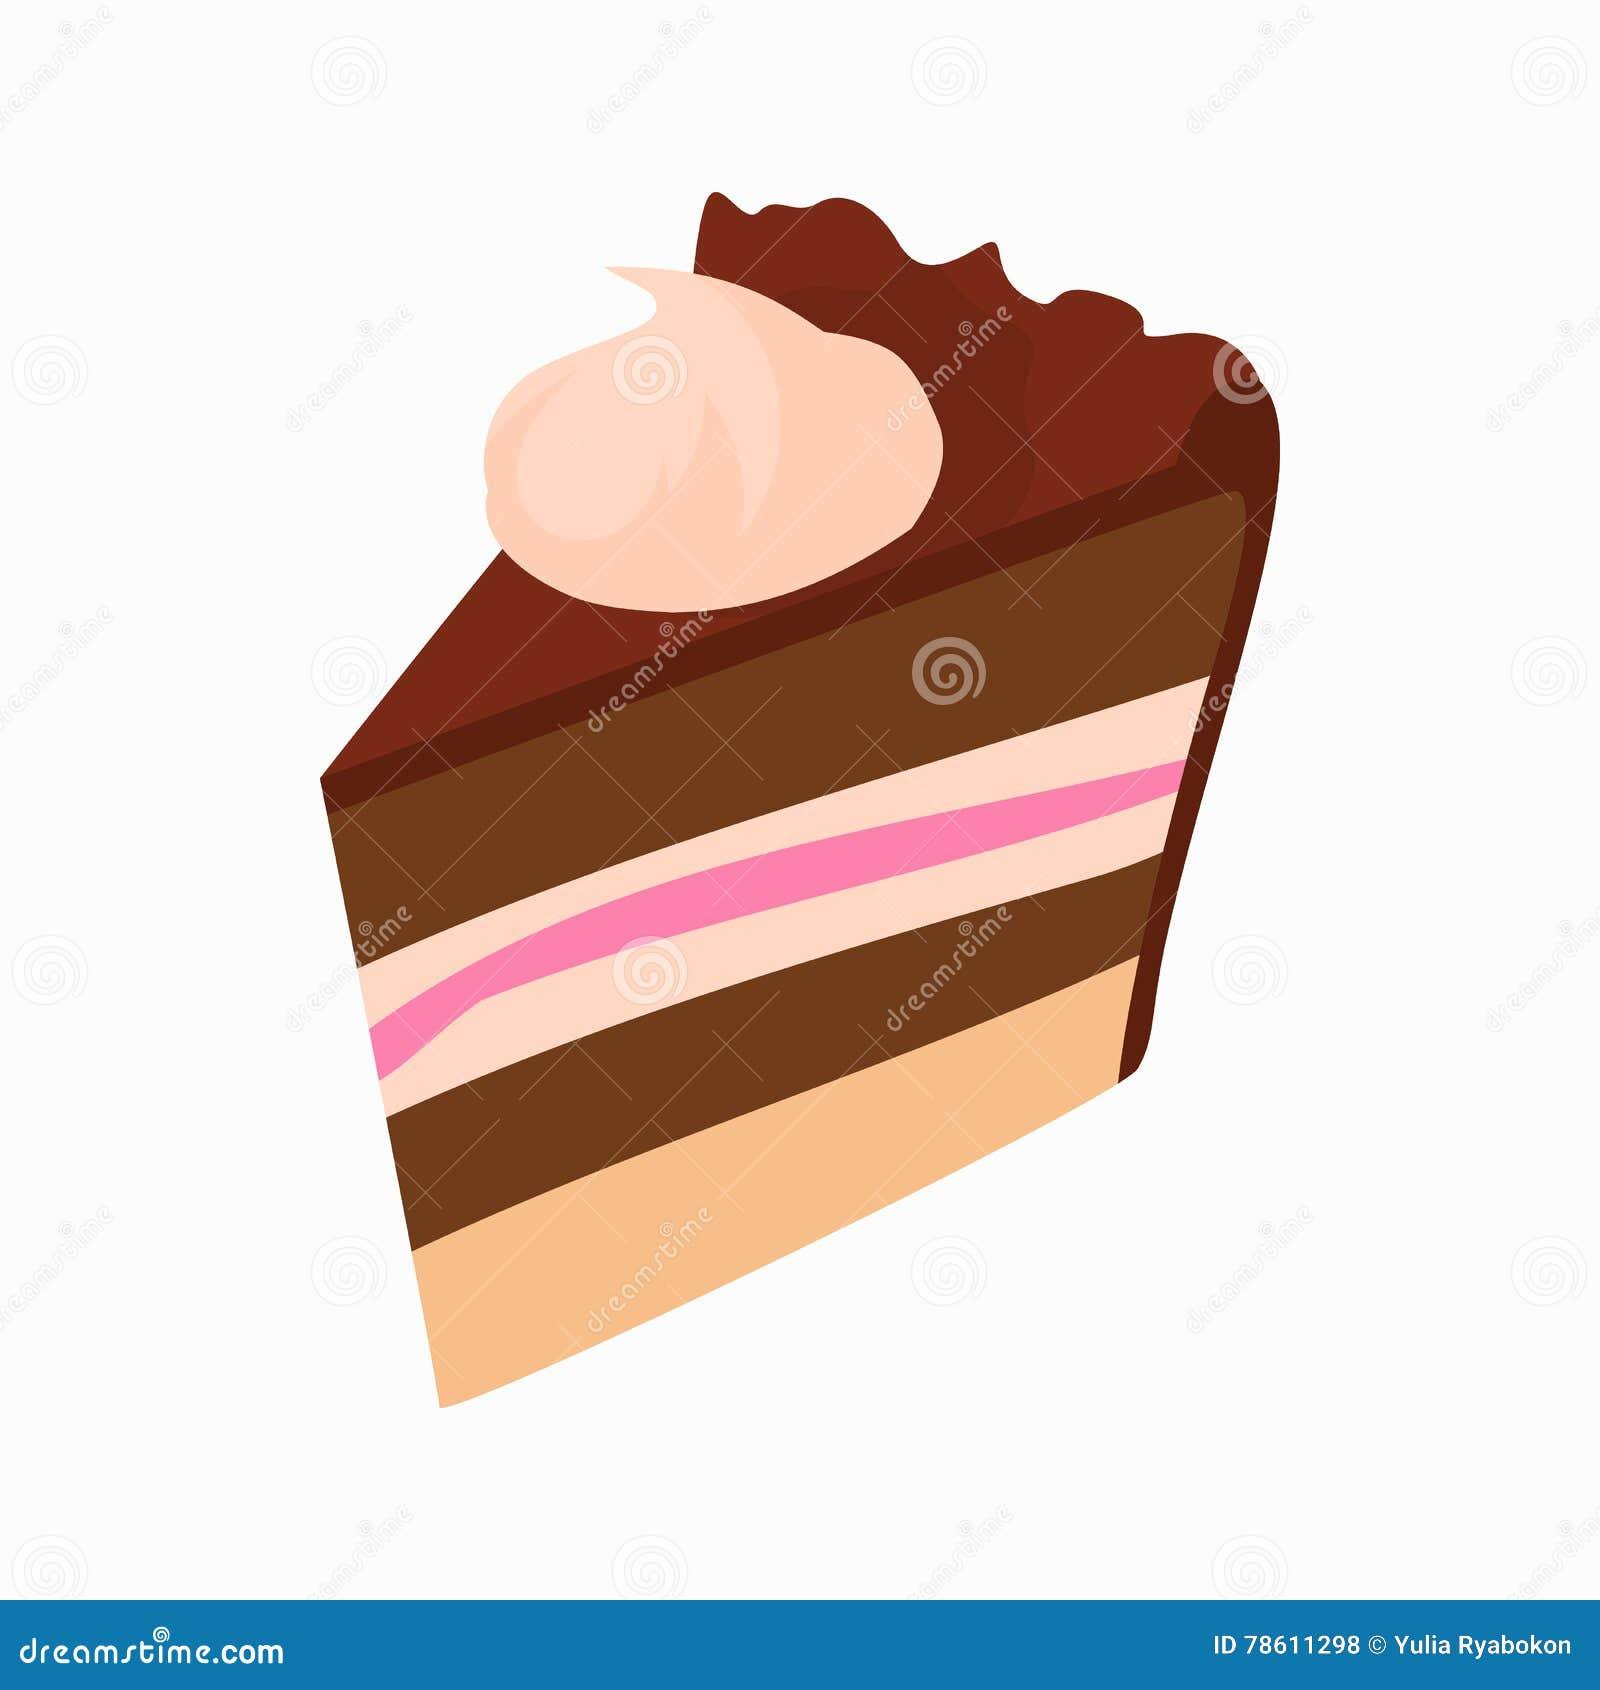 Chocolate Cake Slice Icon, Cartoon Style Stock Vector ...